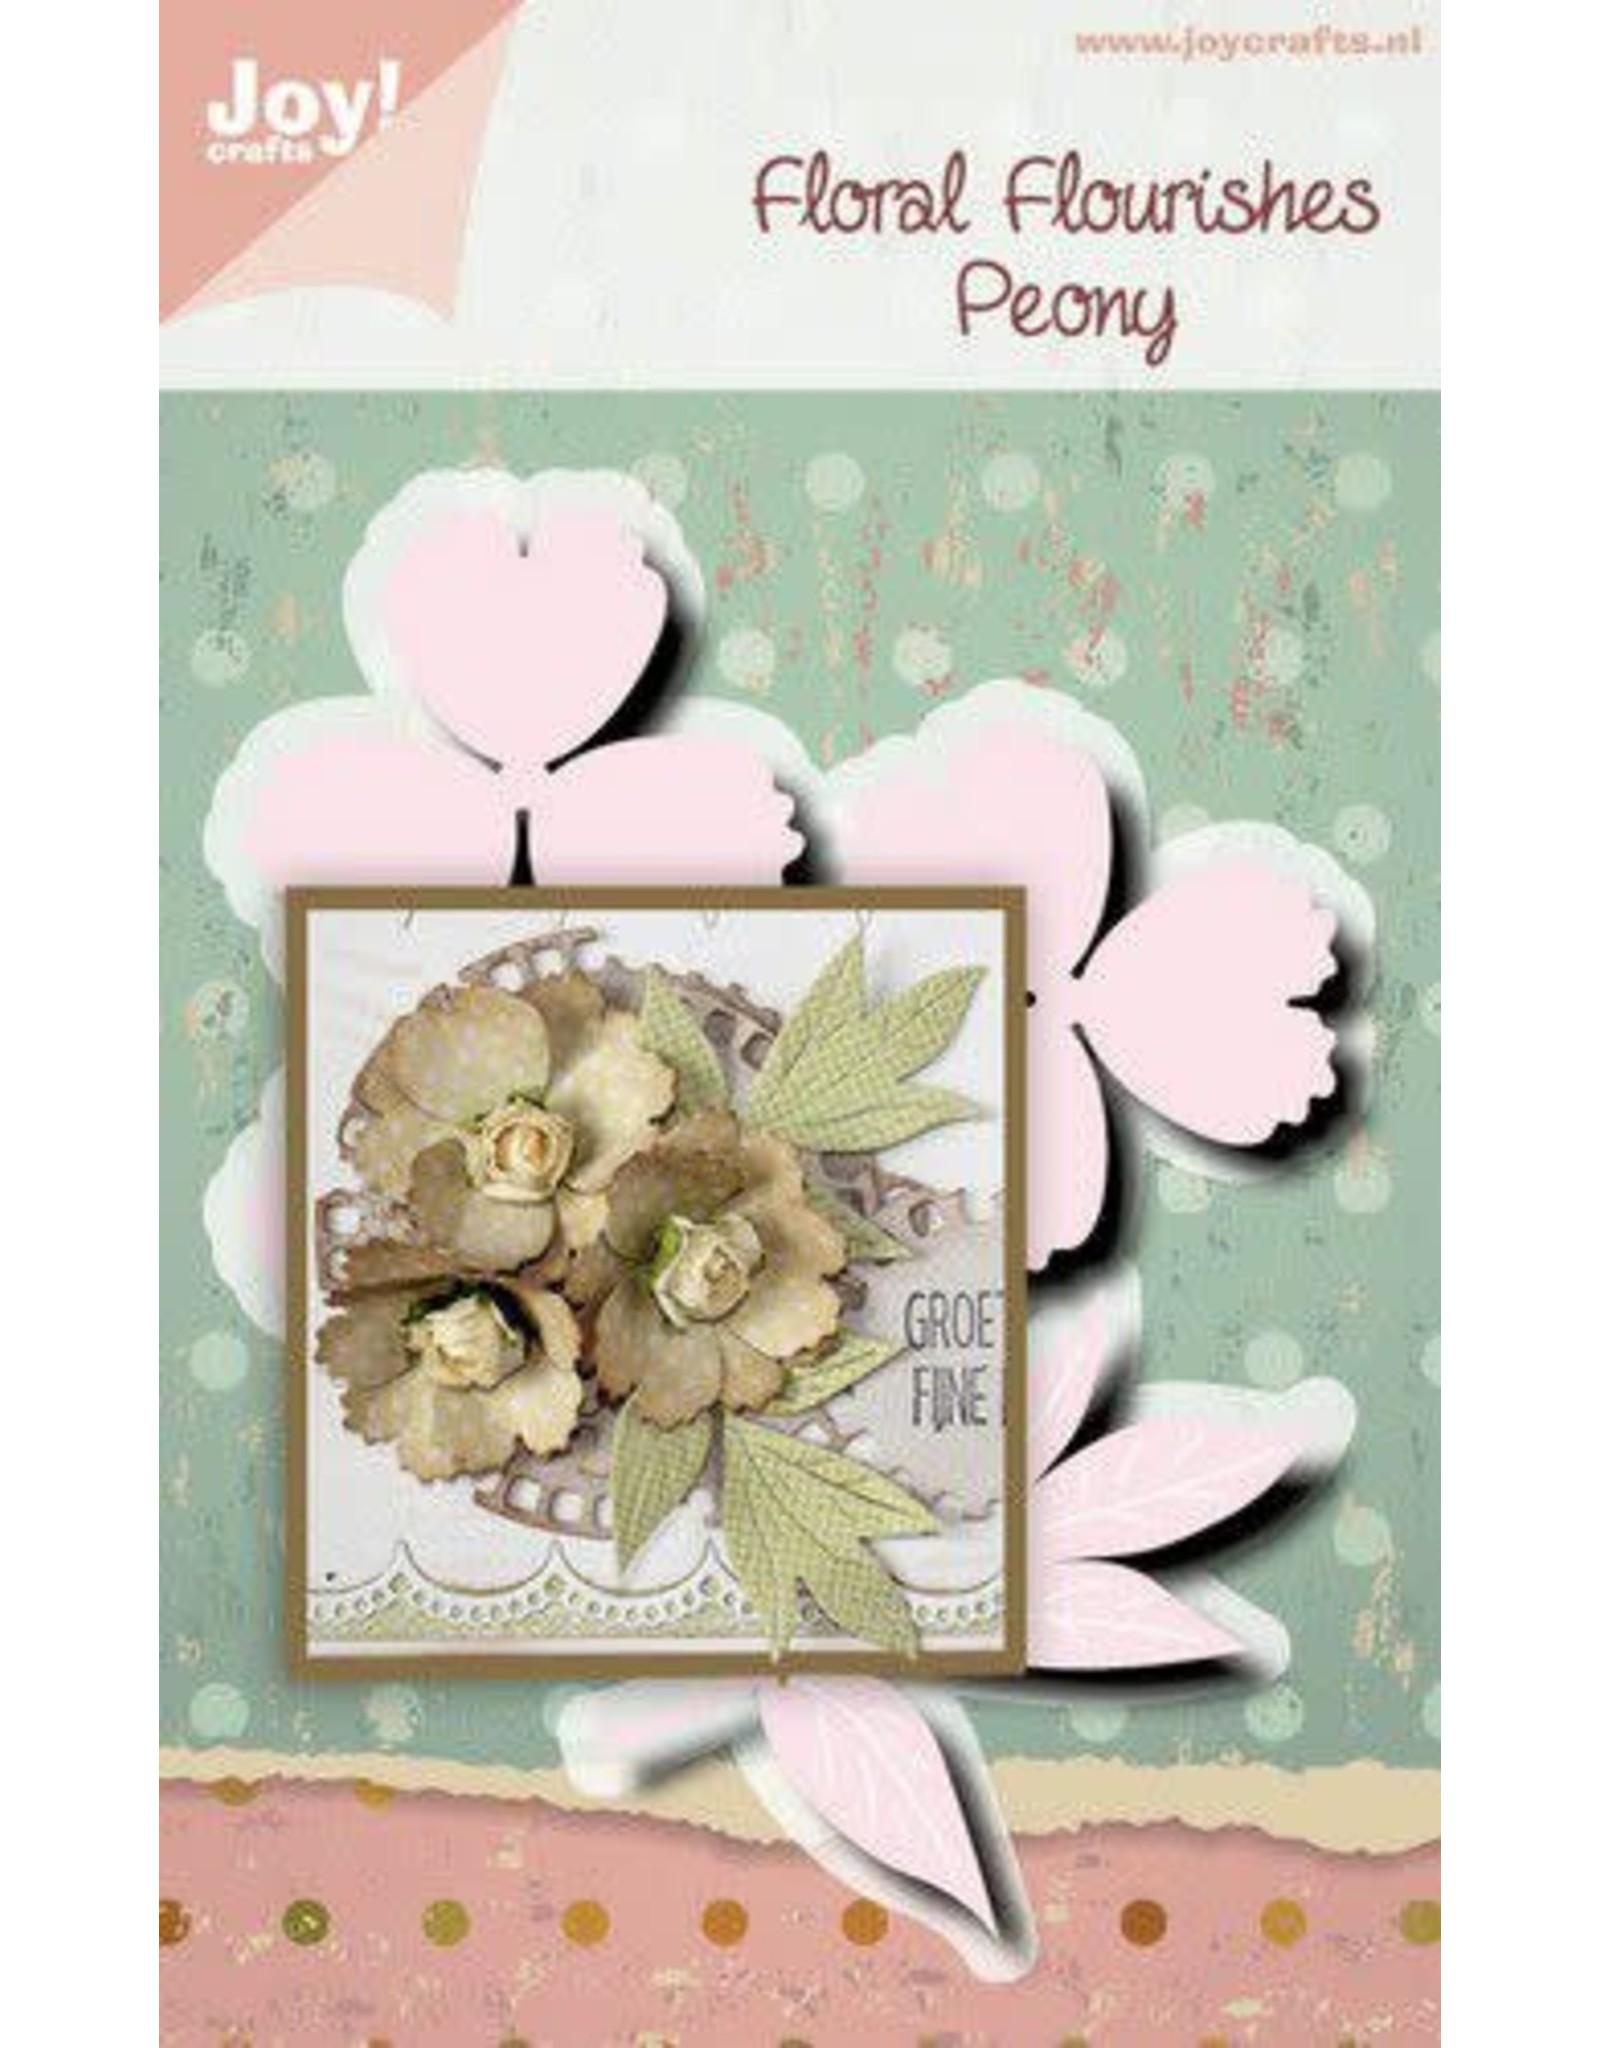 Joy Craft Joy! Crafts Snijstansmal - Noor - FF - Pioenroos 6002/1514 112x85,5 mm